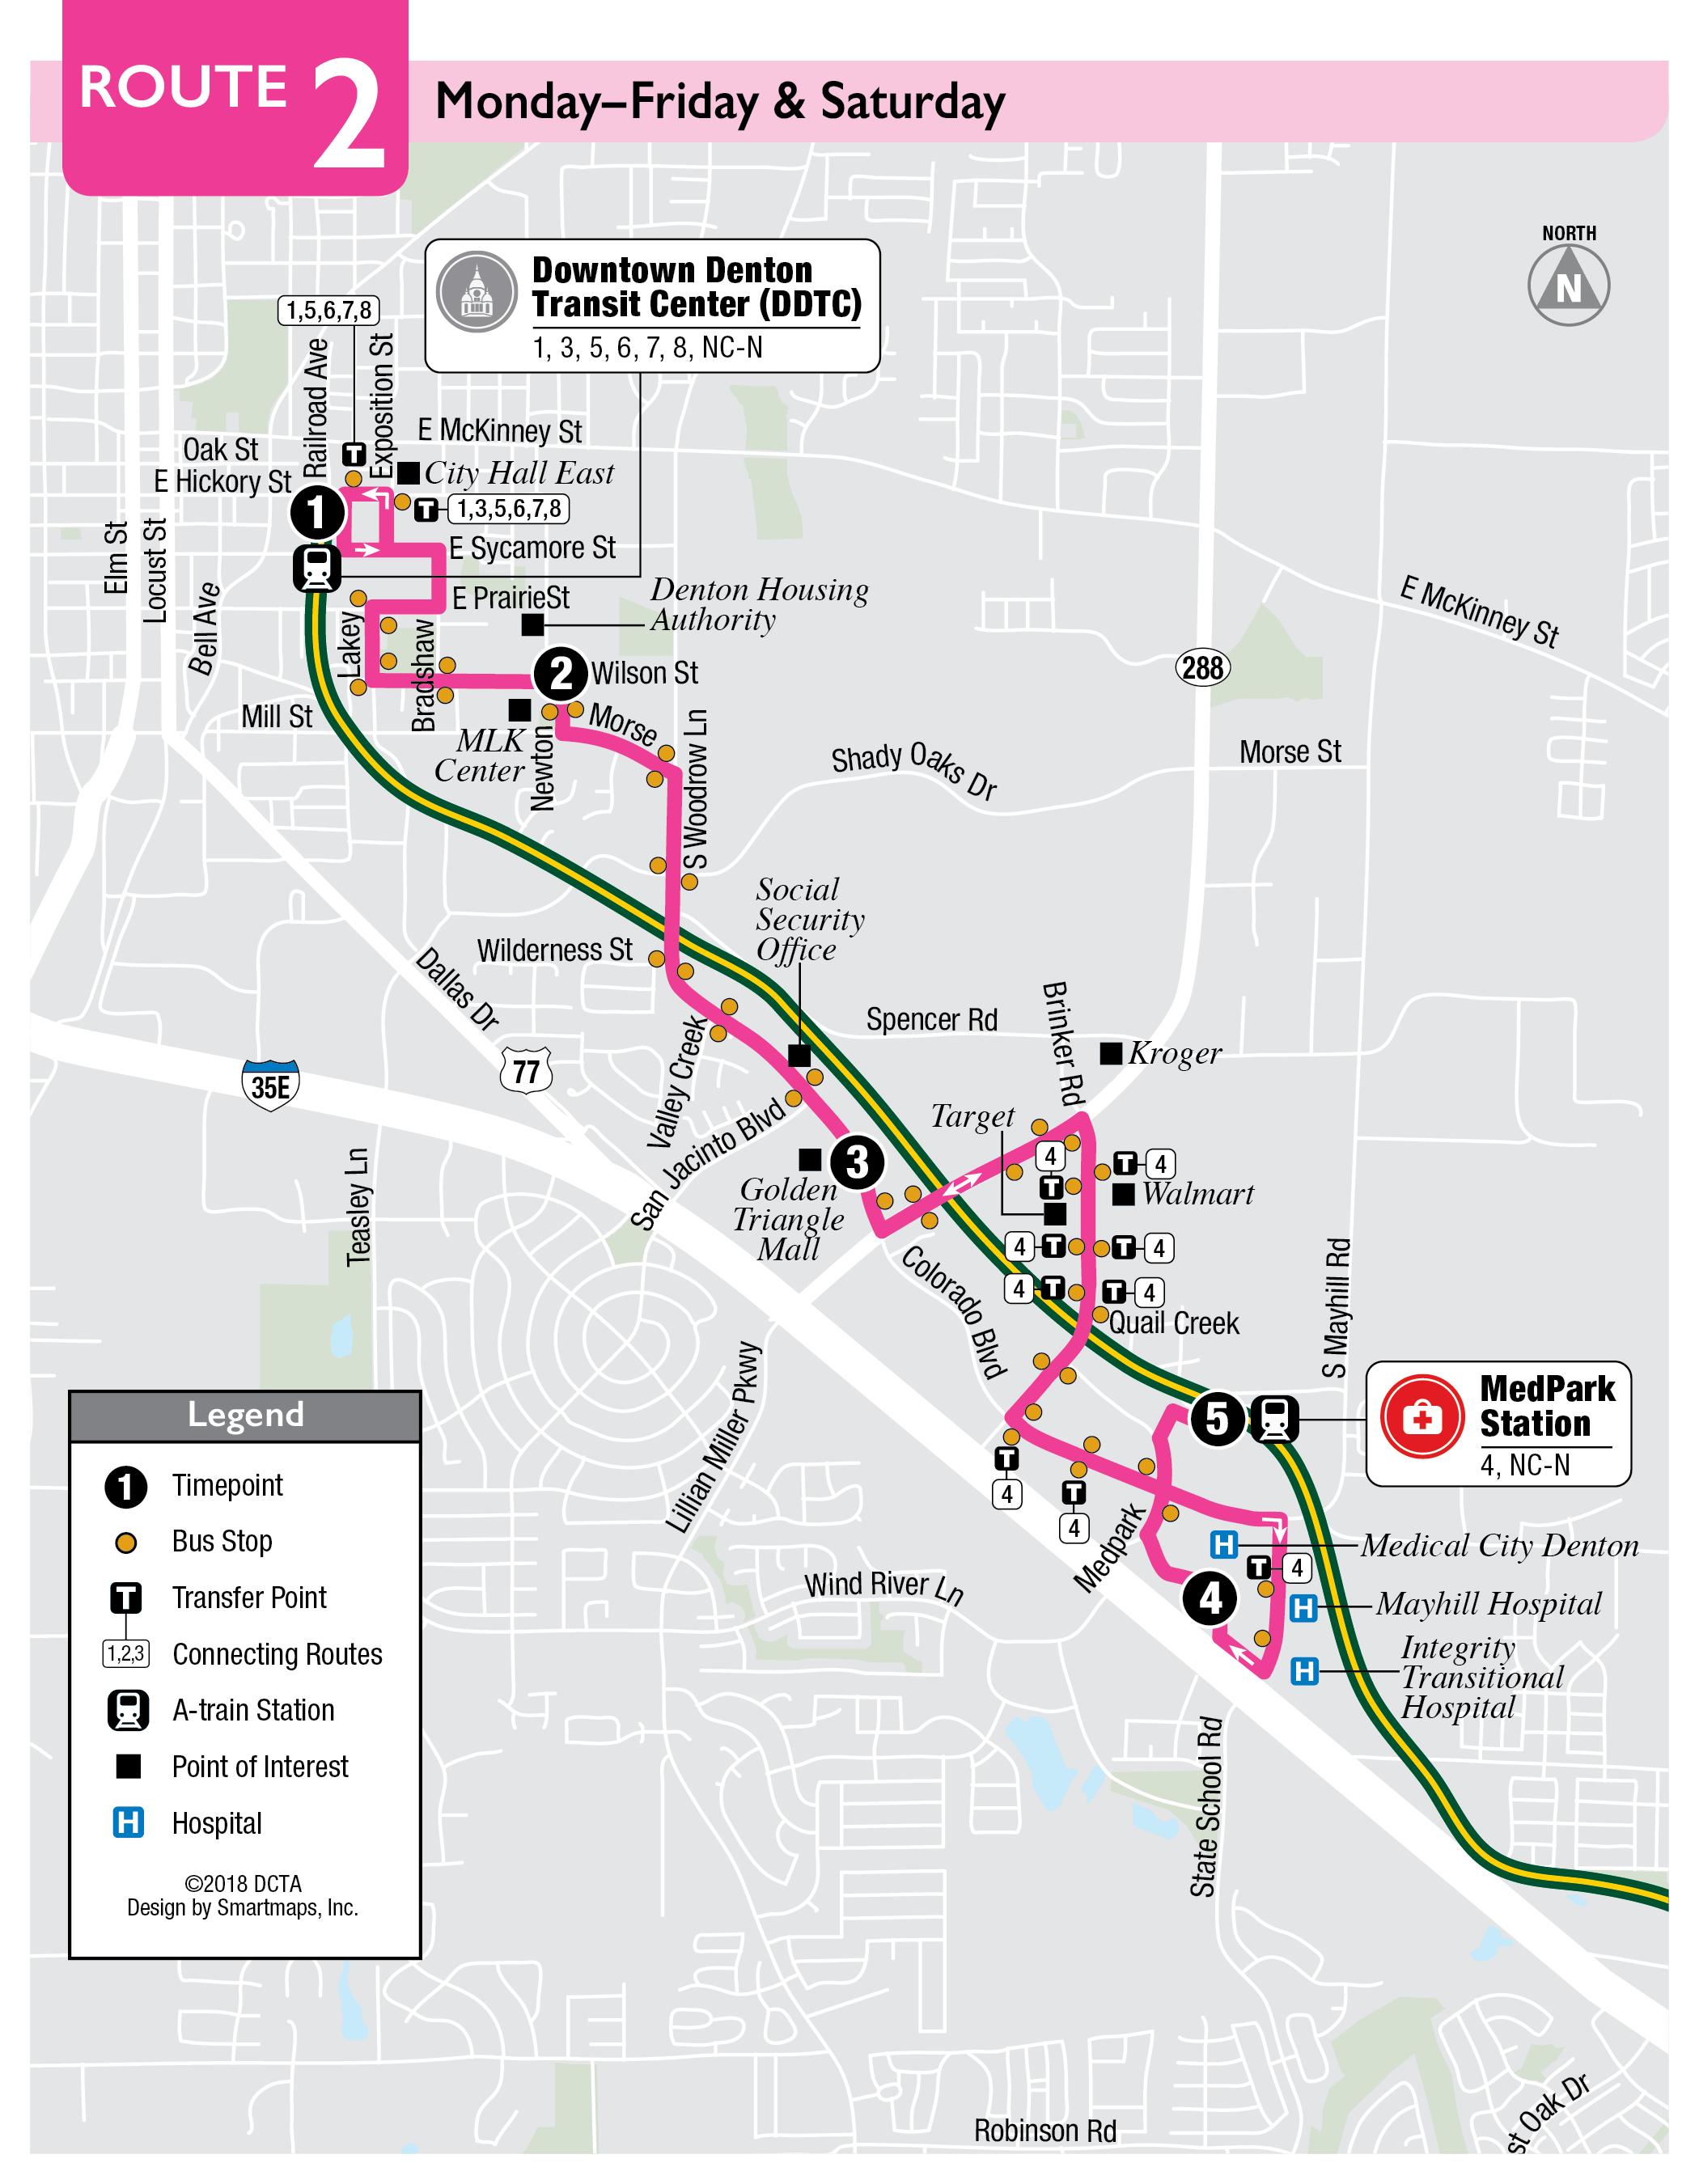 Route 2 Denton County Transportation Authority